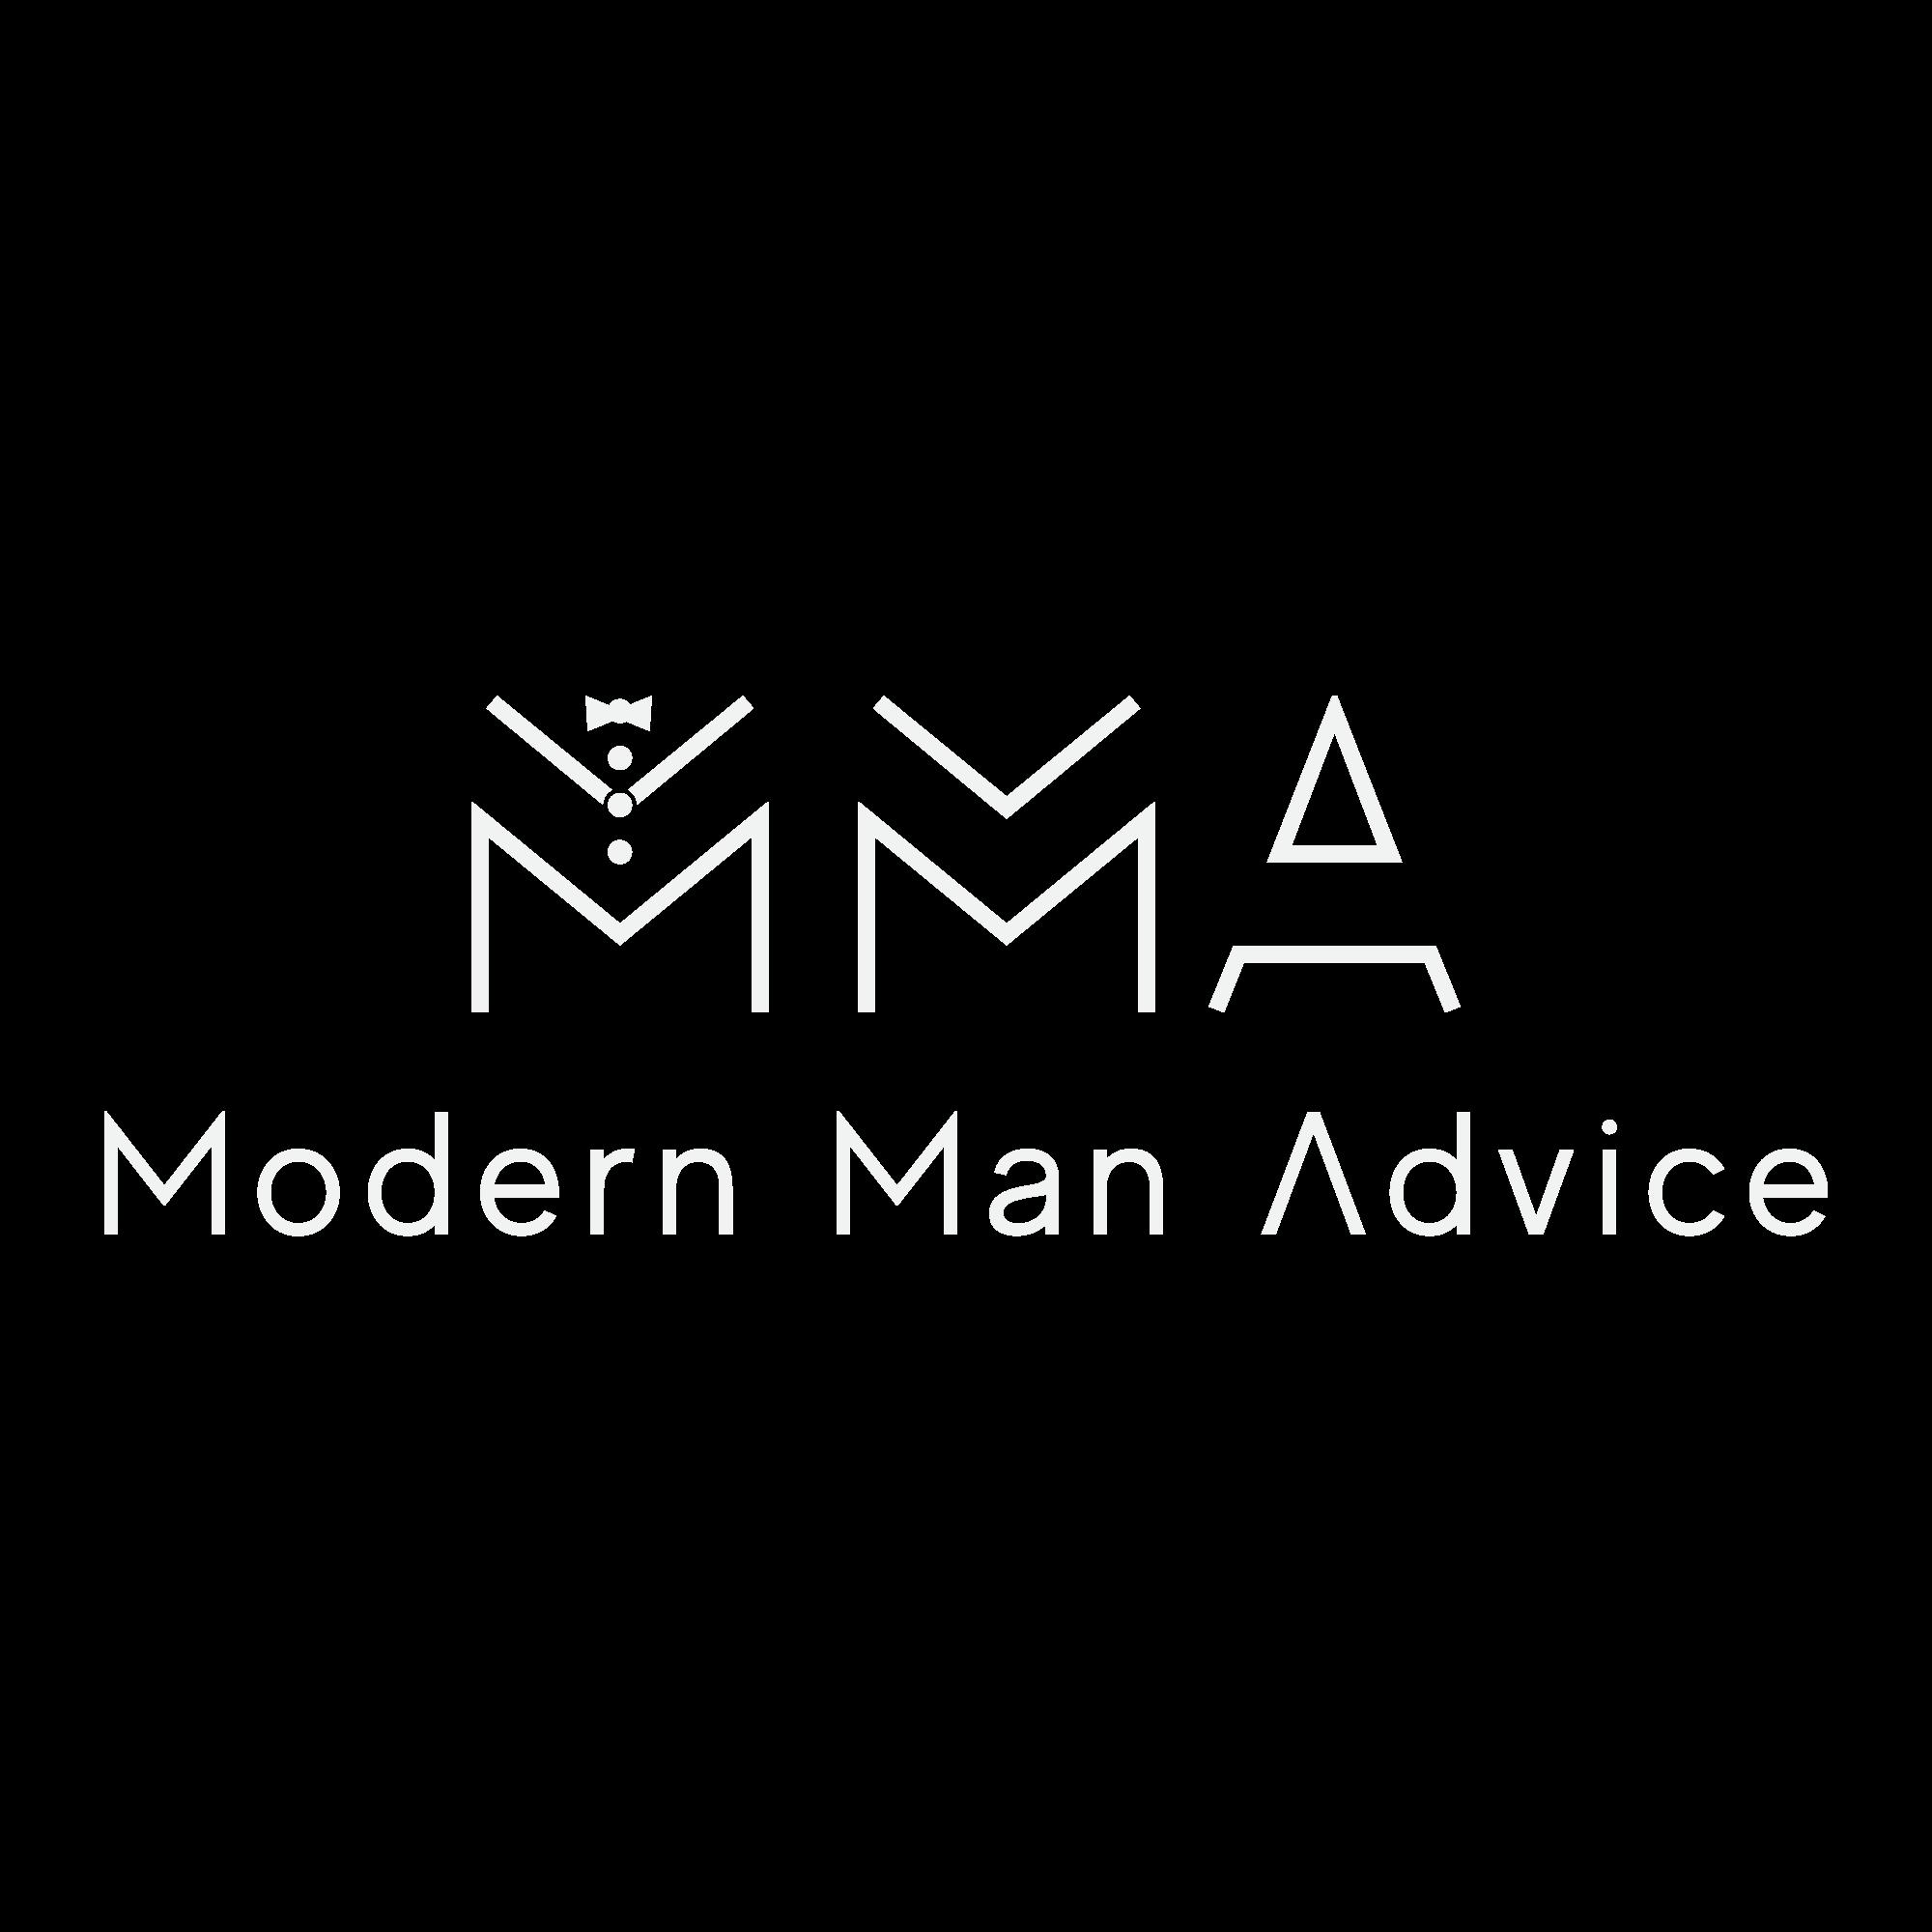 Modern Man Advice